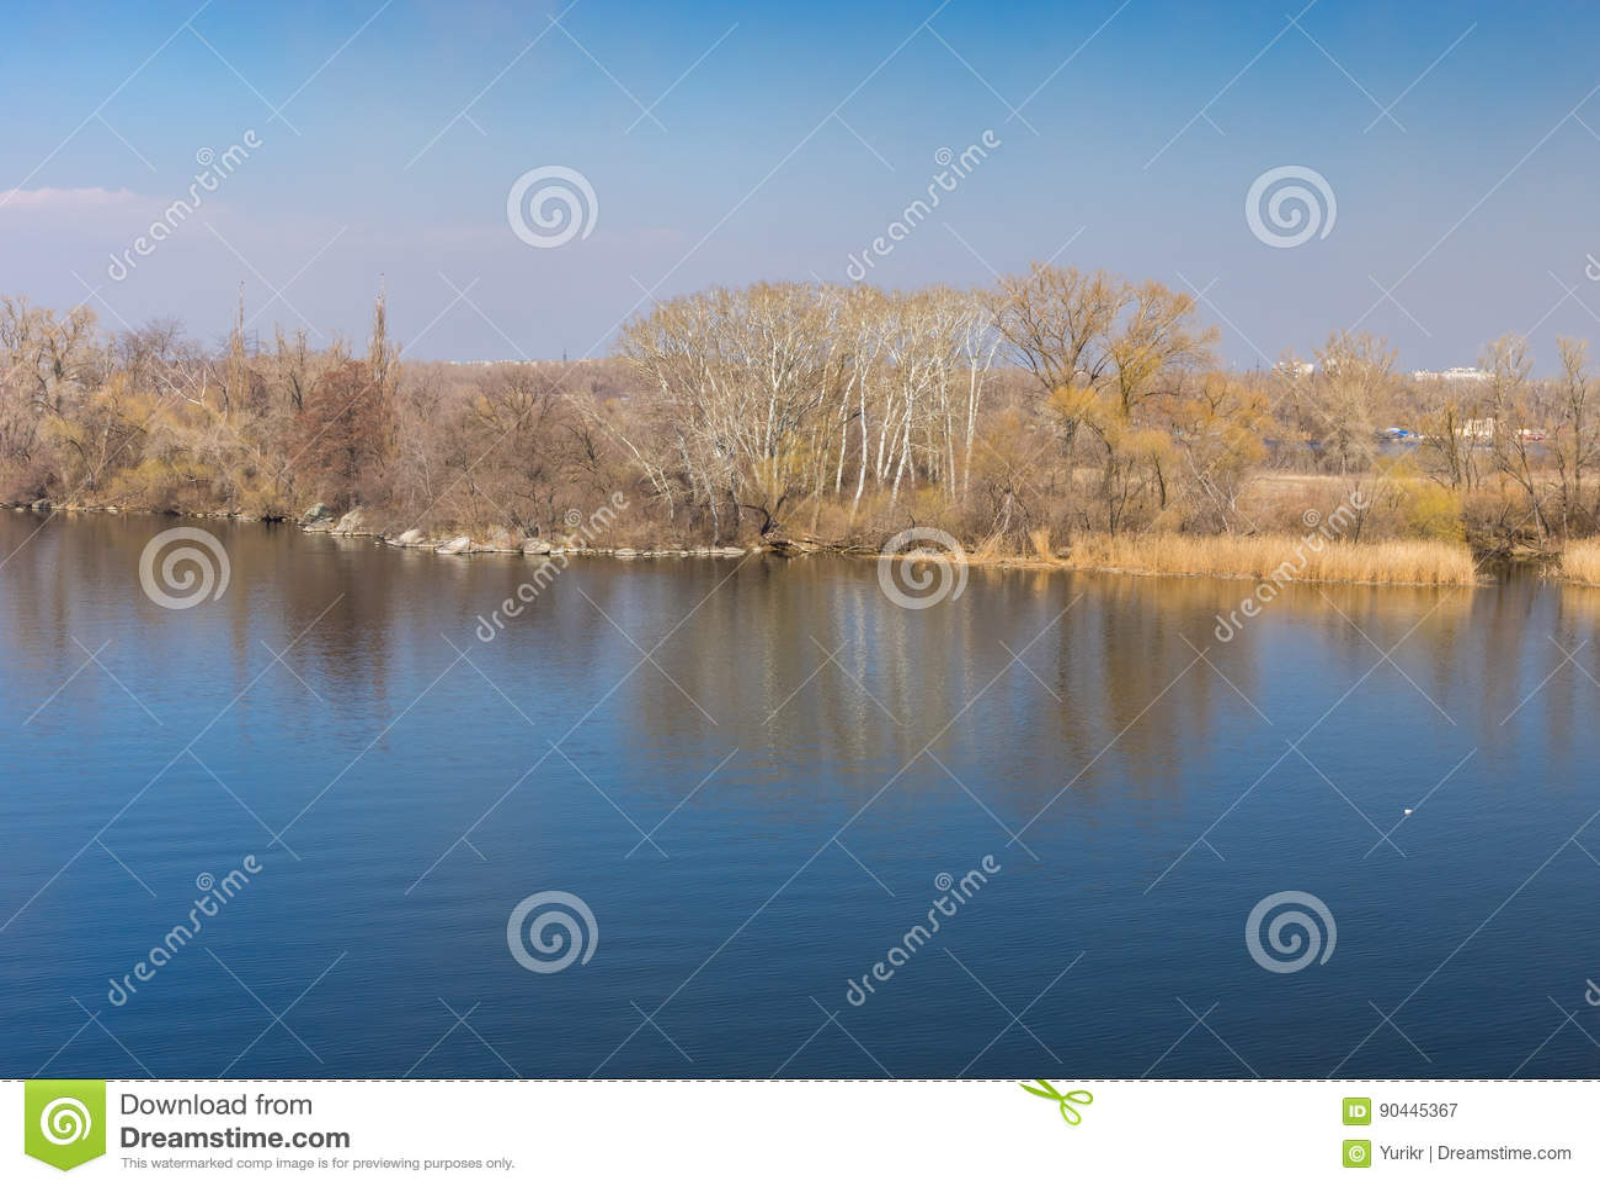 Landscape with Dnepr river near Dnepr city, Ukraine